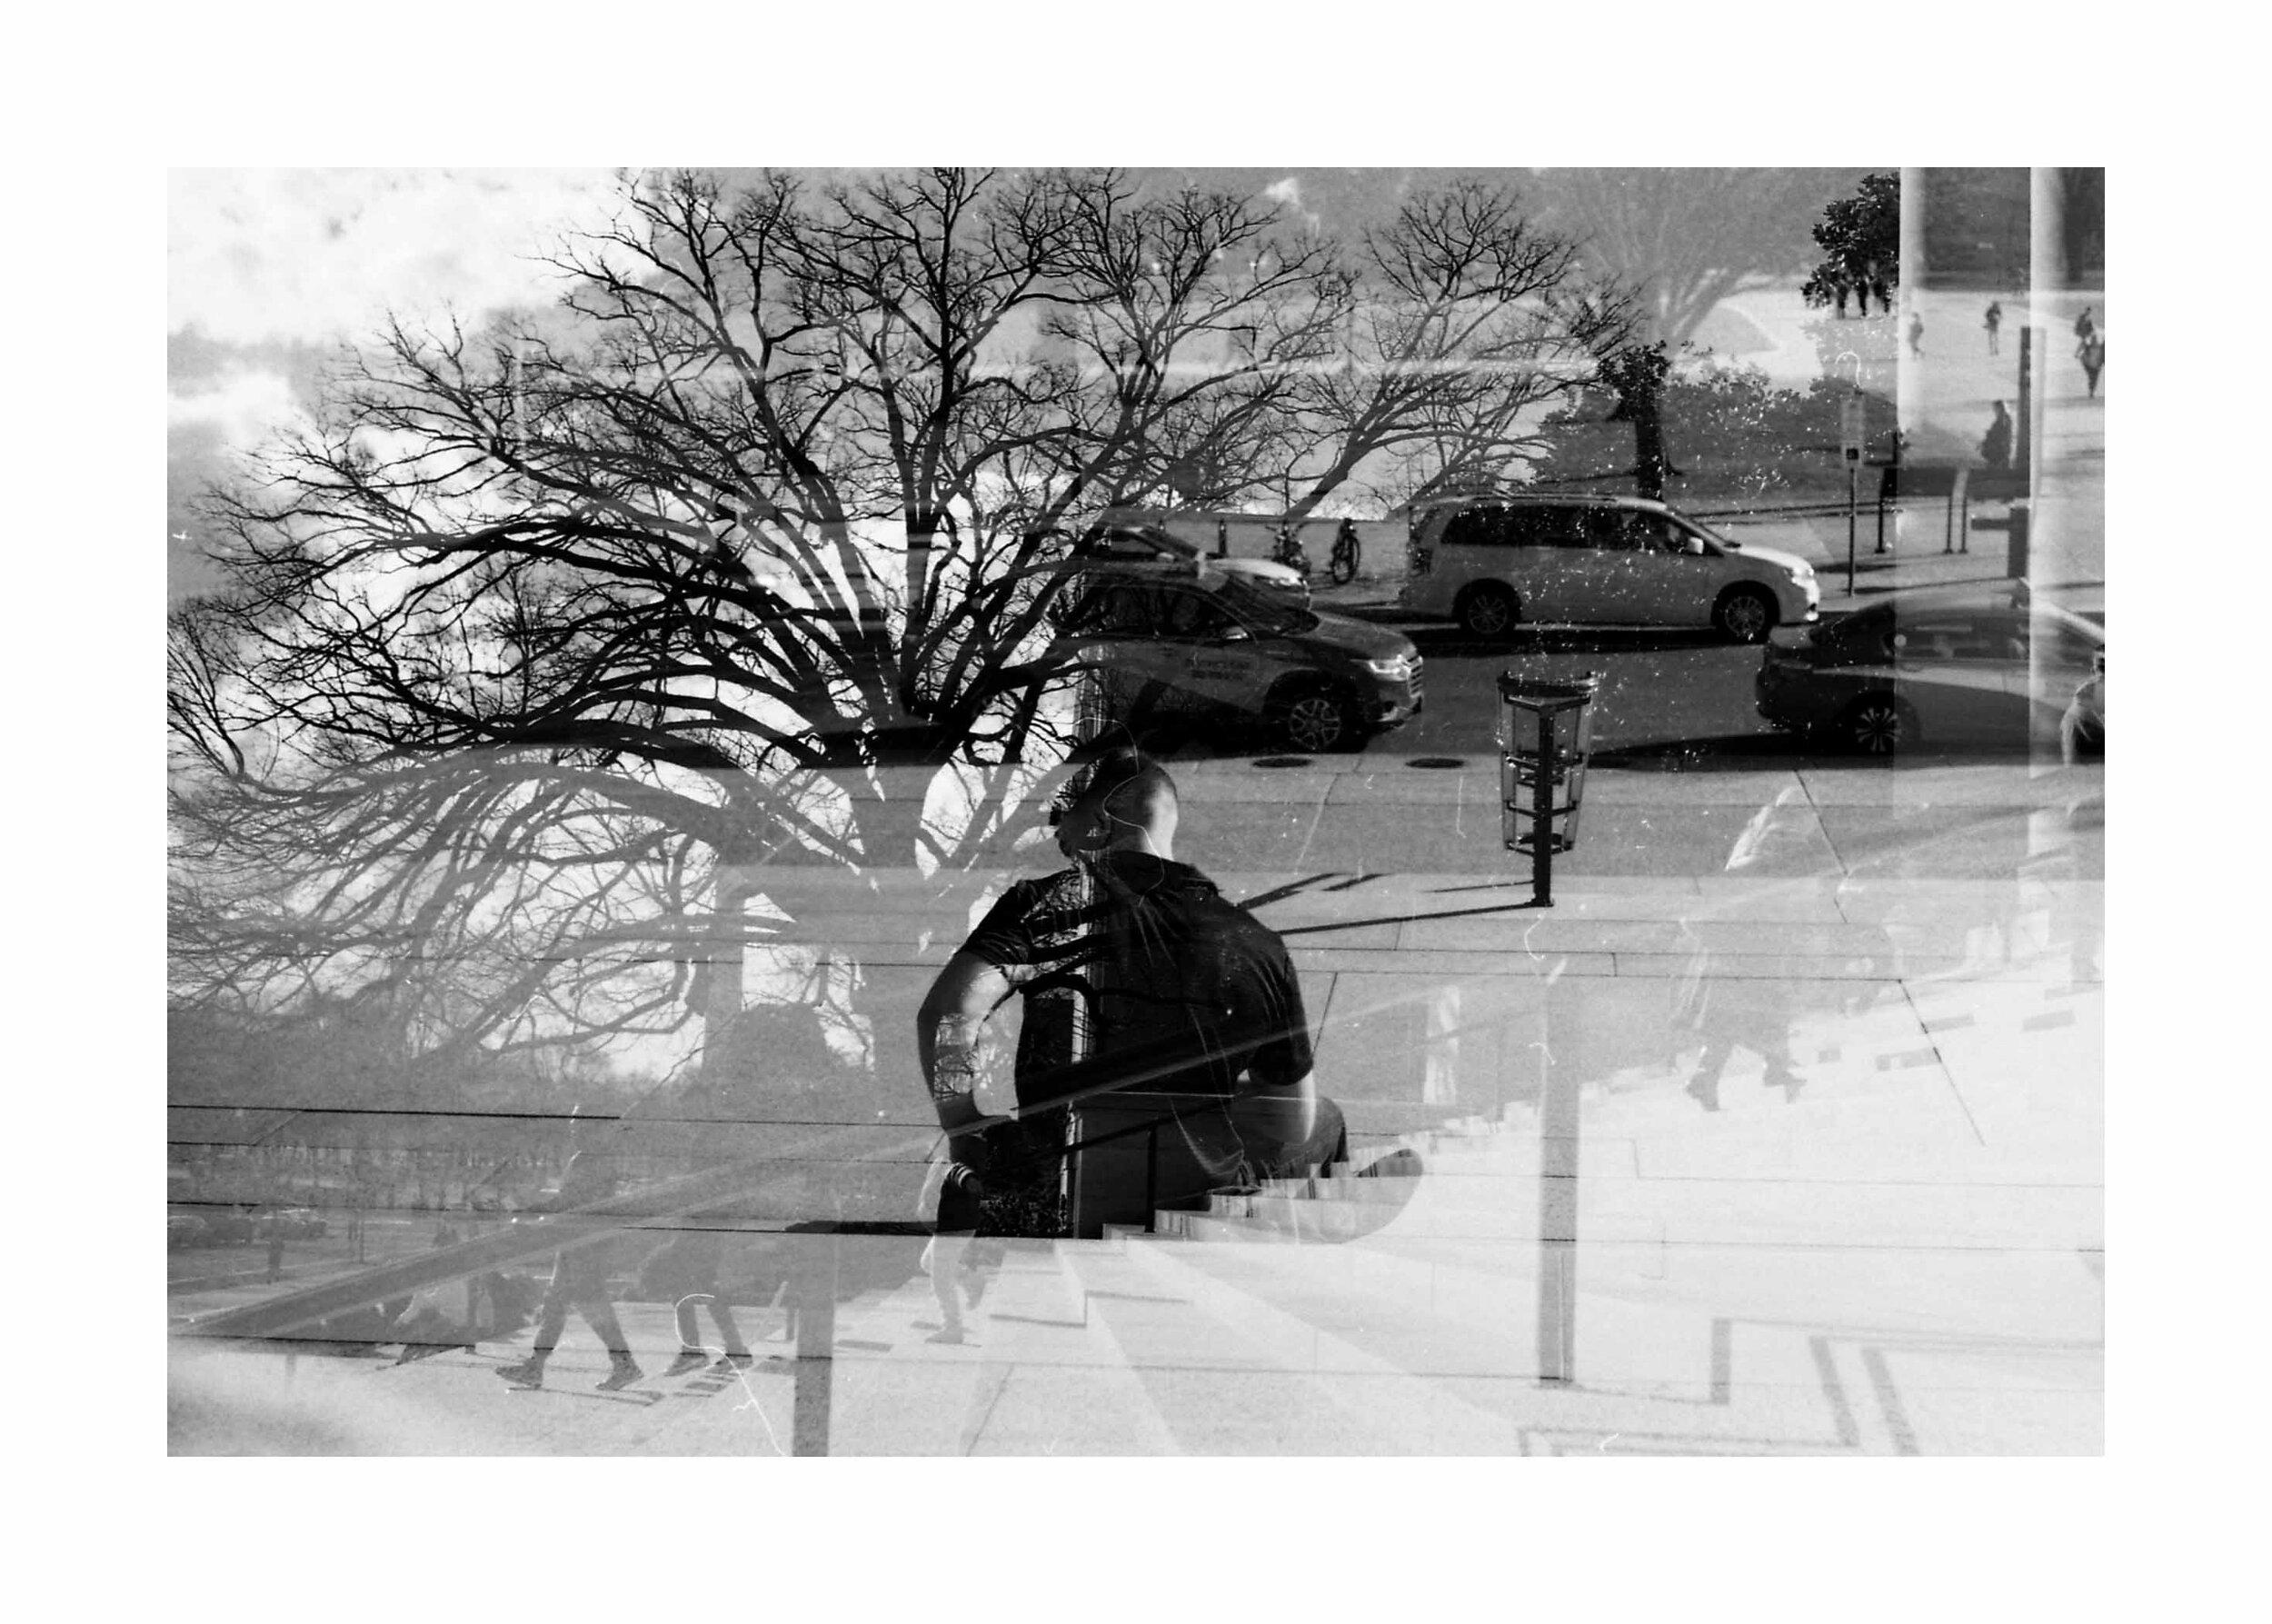 washington+dc+003.jpg